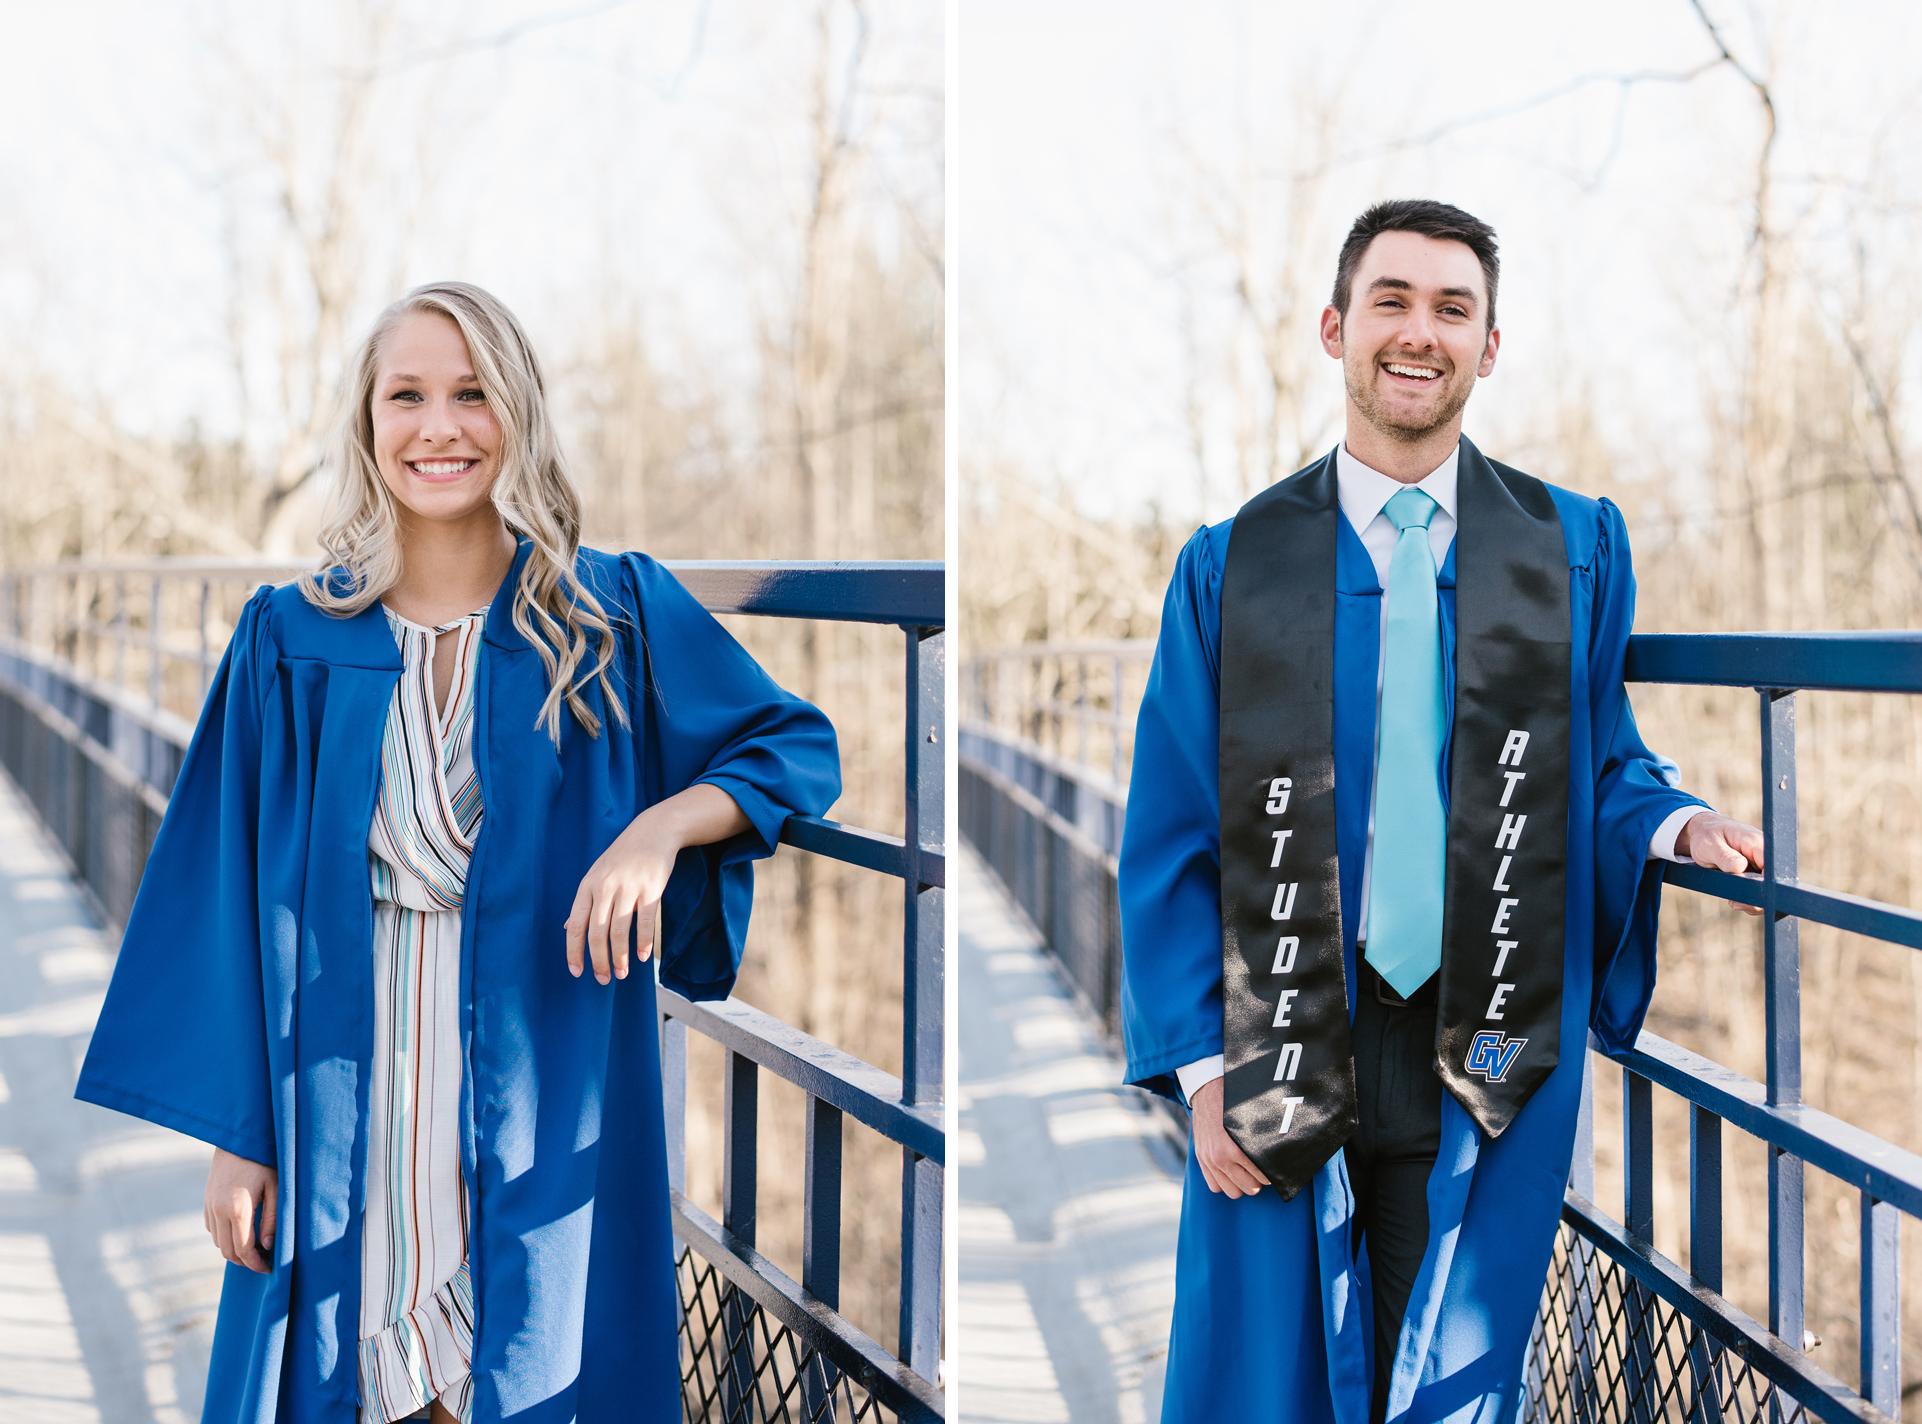 GVSU-michigan-college-graduation-session-gown.jpg